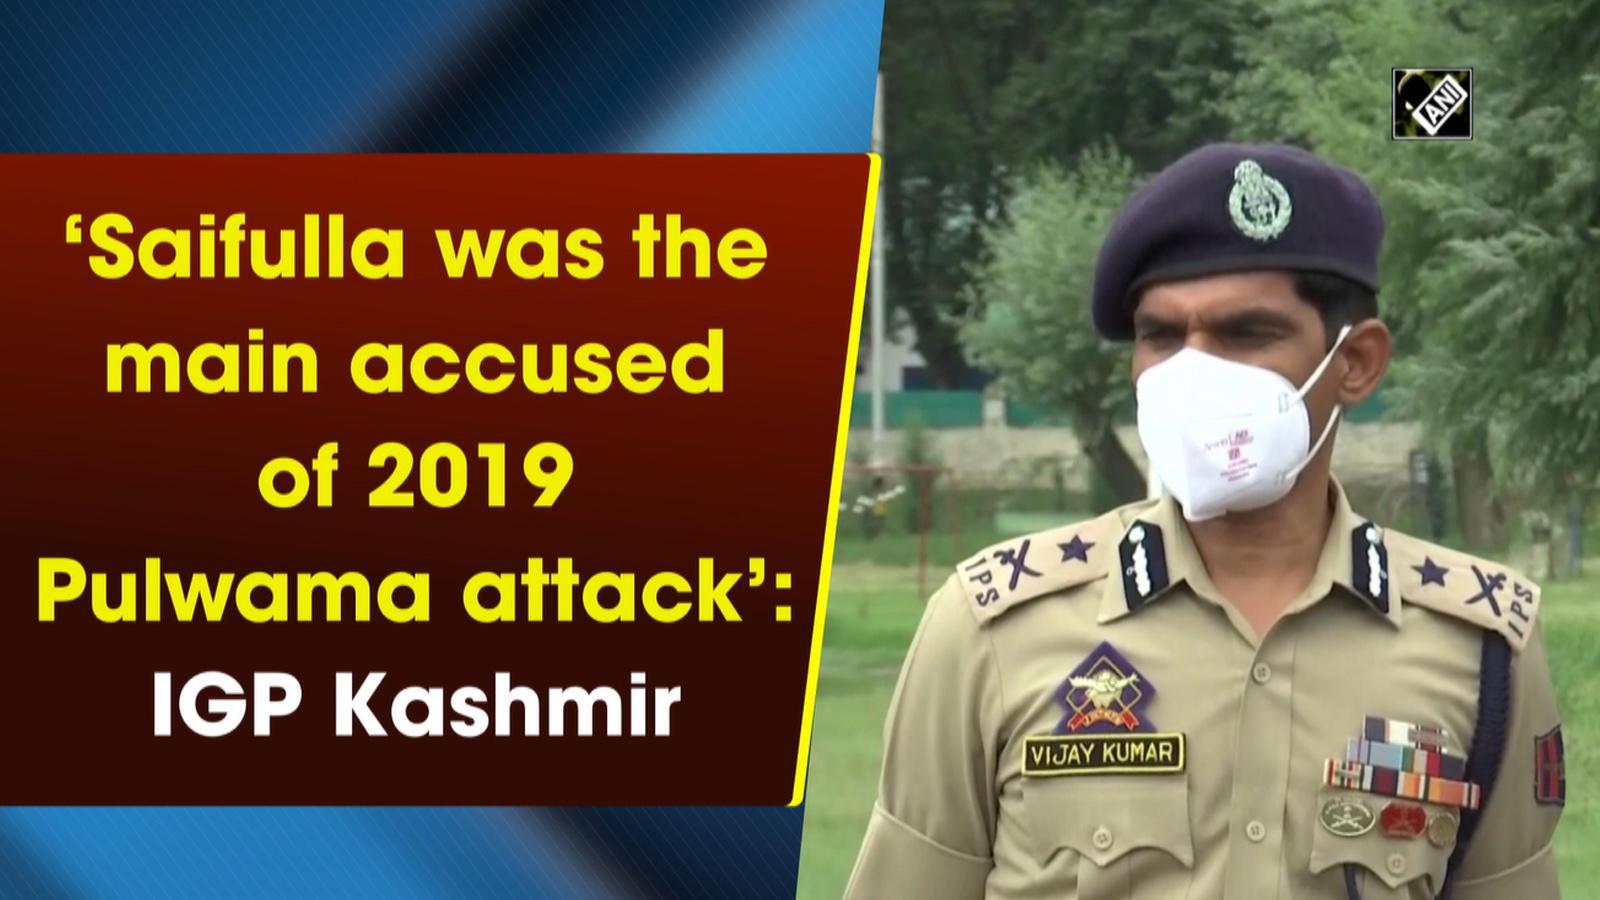 saifulla-was-the-main-accused-of-2019-pulwama-attack-igp-kashmir